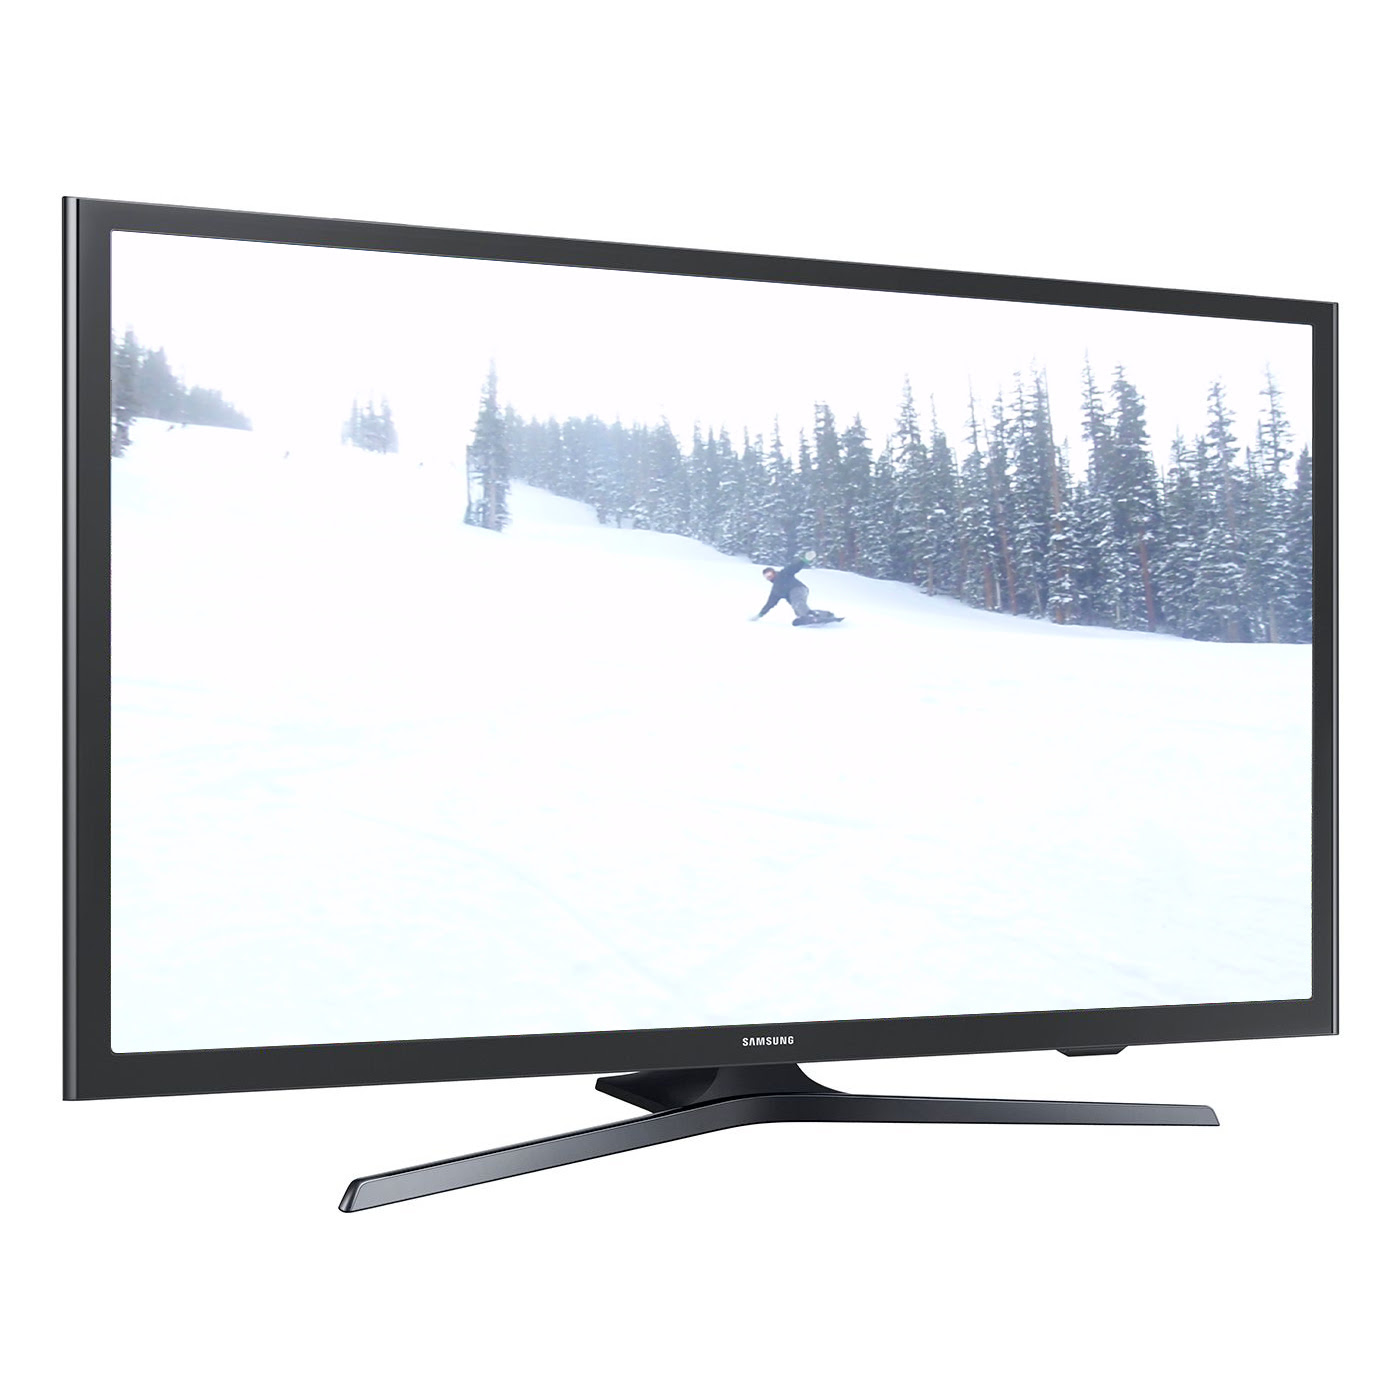 Buy Samsung Bn44 00394d Ad 3014n Ac Adapter 30 Watts 14 V 214 Handsfree Hm60 For Purple Refurbished 48 Class 1080p Led Smart Hdtv Un48j520d